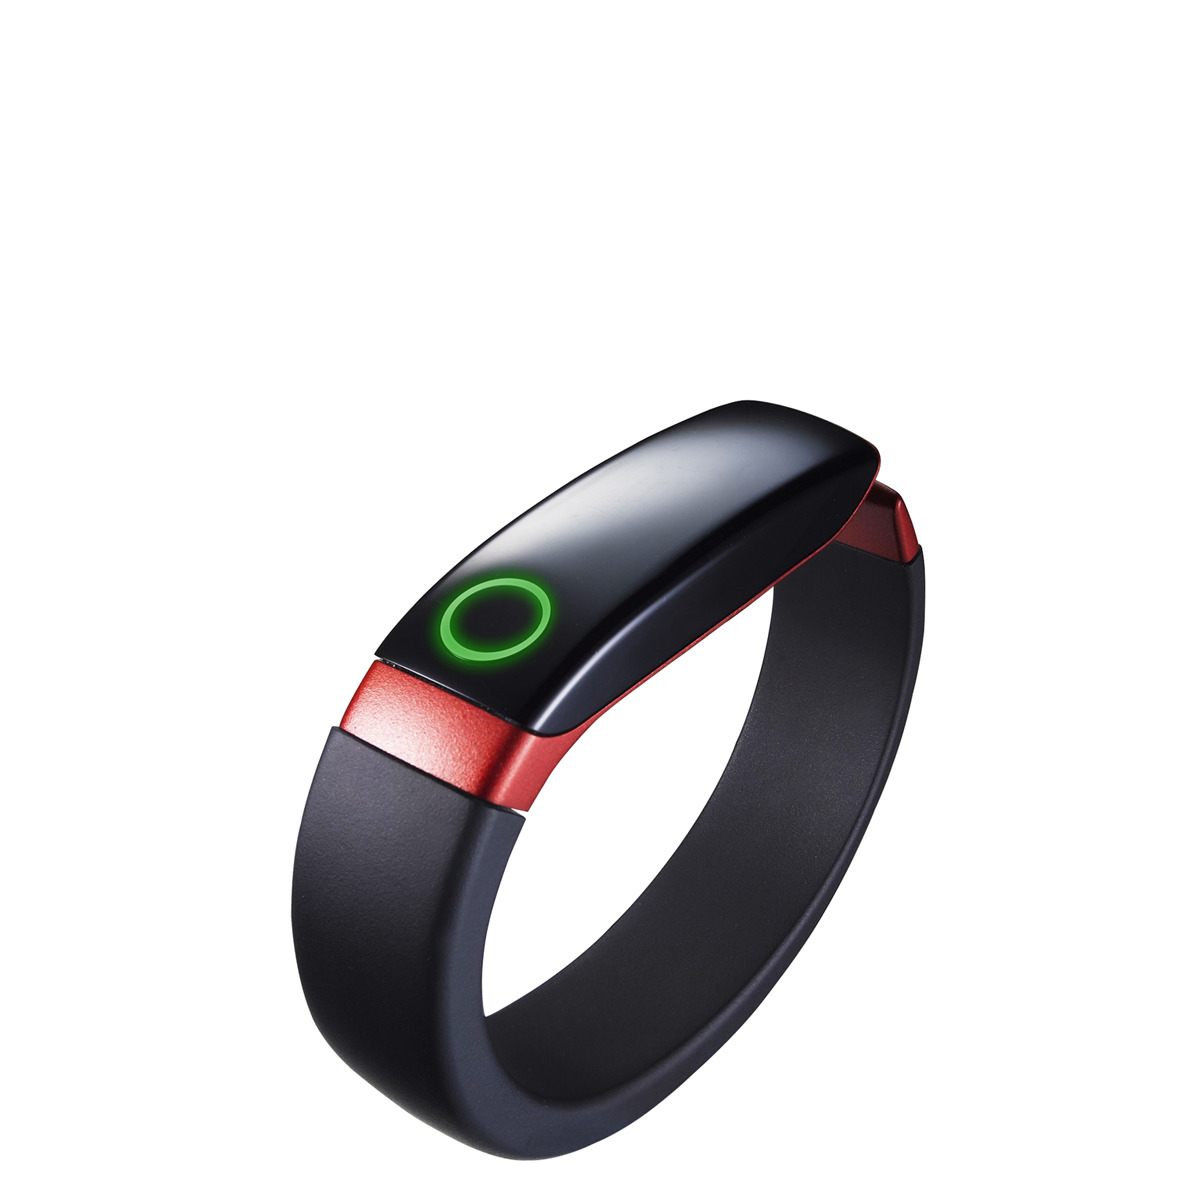 Pulsera de actividad inalámbrica LG Lifeband Touch con Bluetooth Pequeña